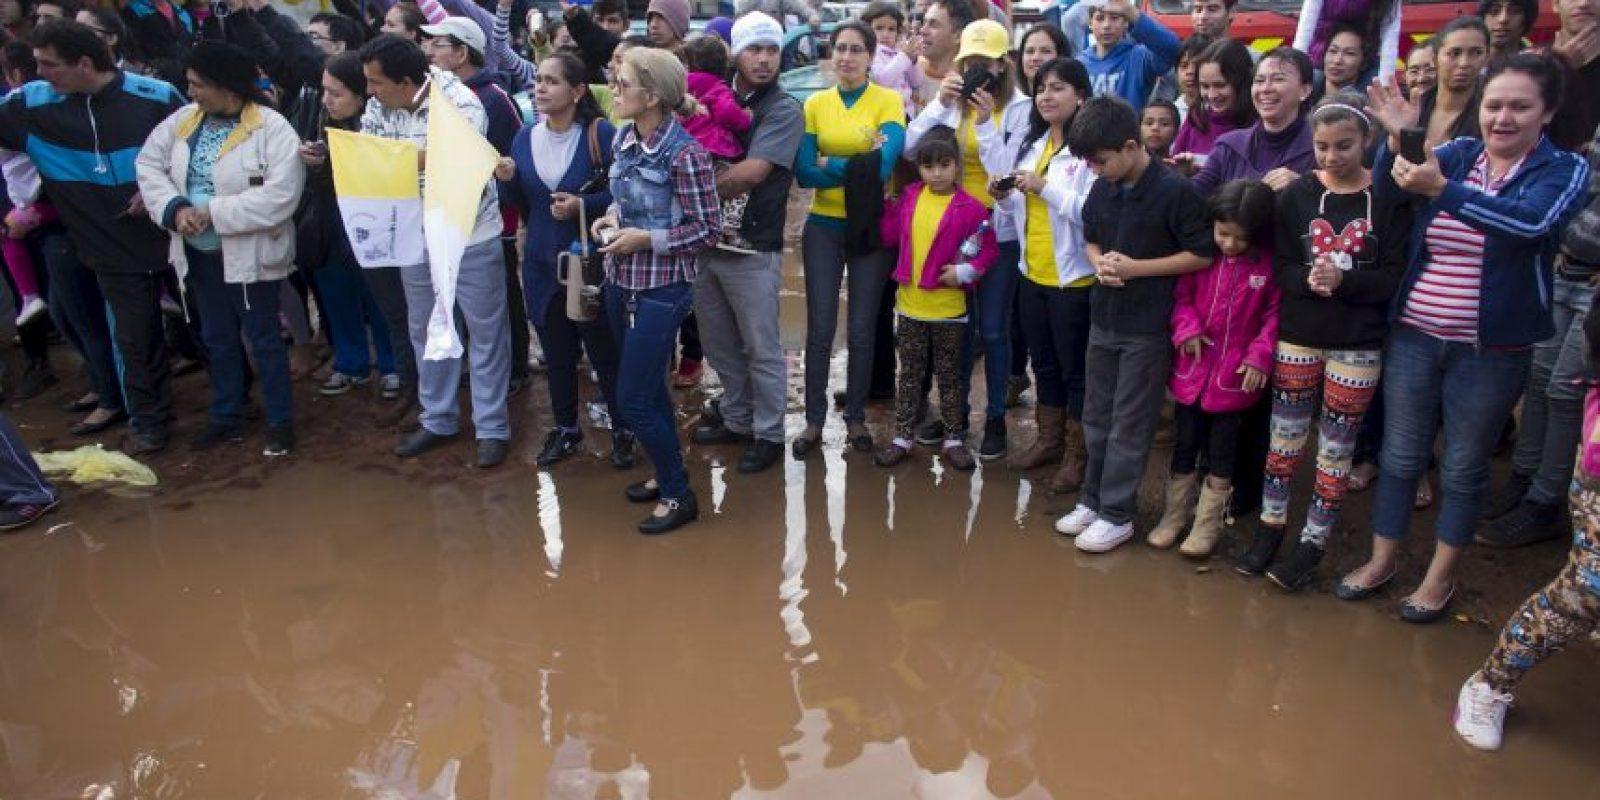 A pesar de todo, miles de personas esperaron por horas para poderlo ver Foto:AP